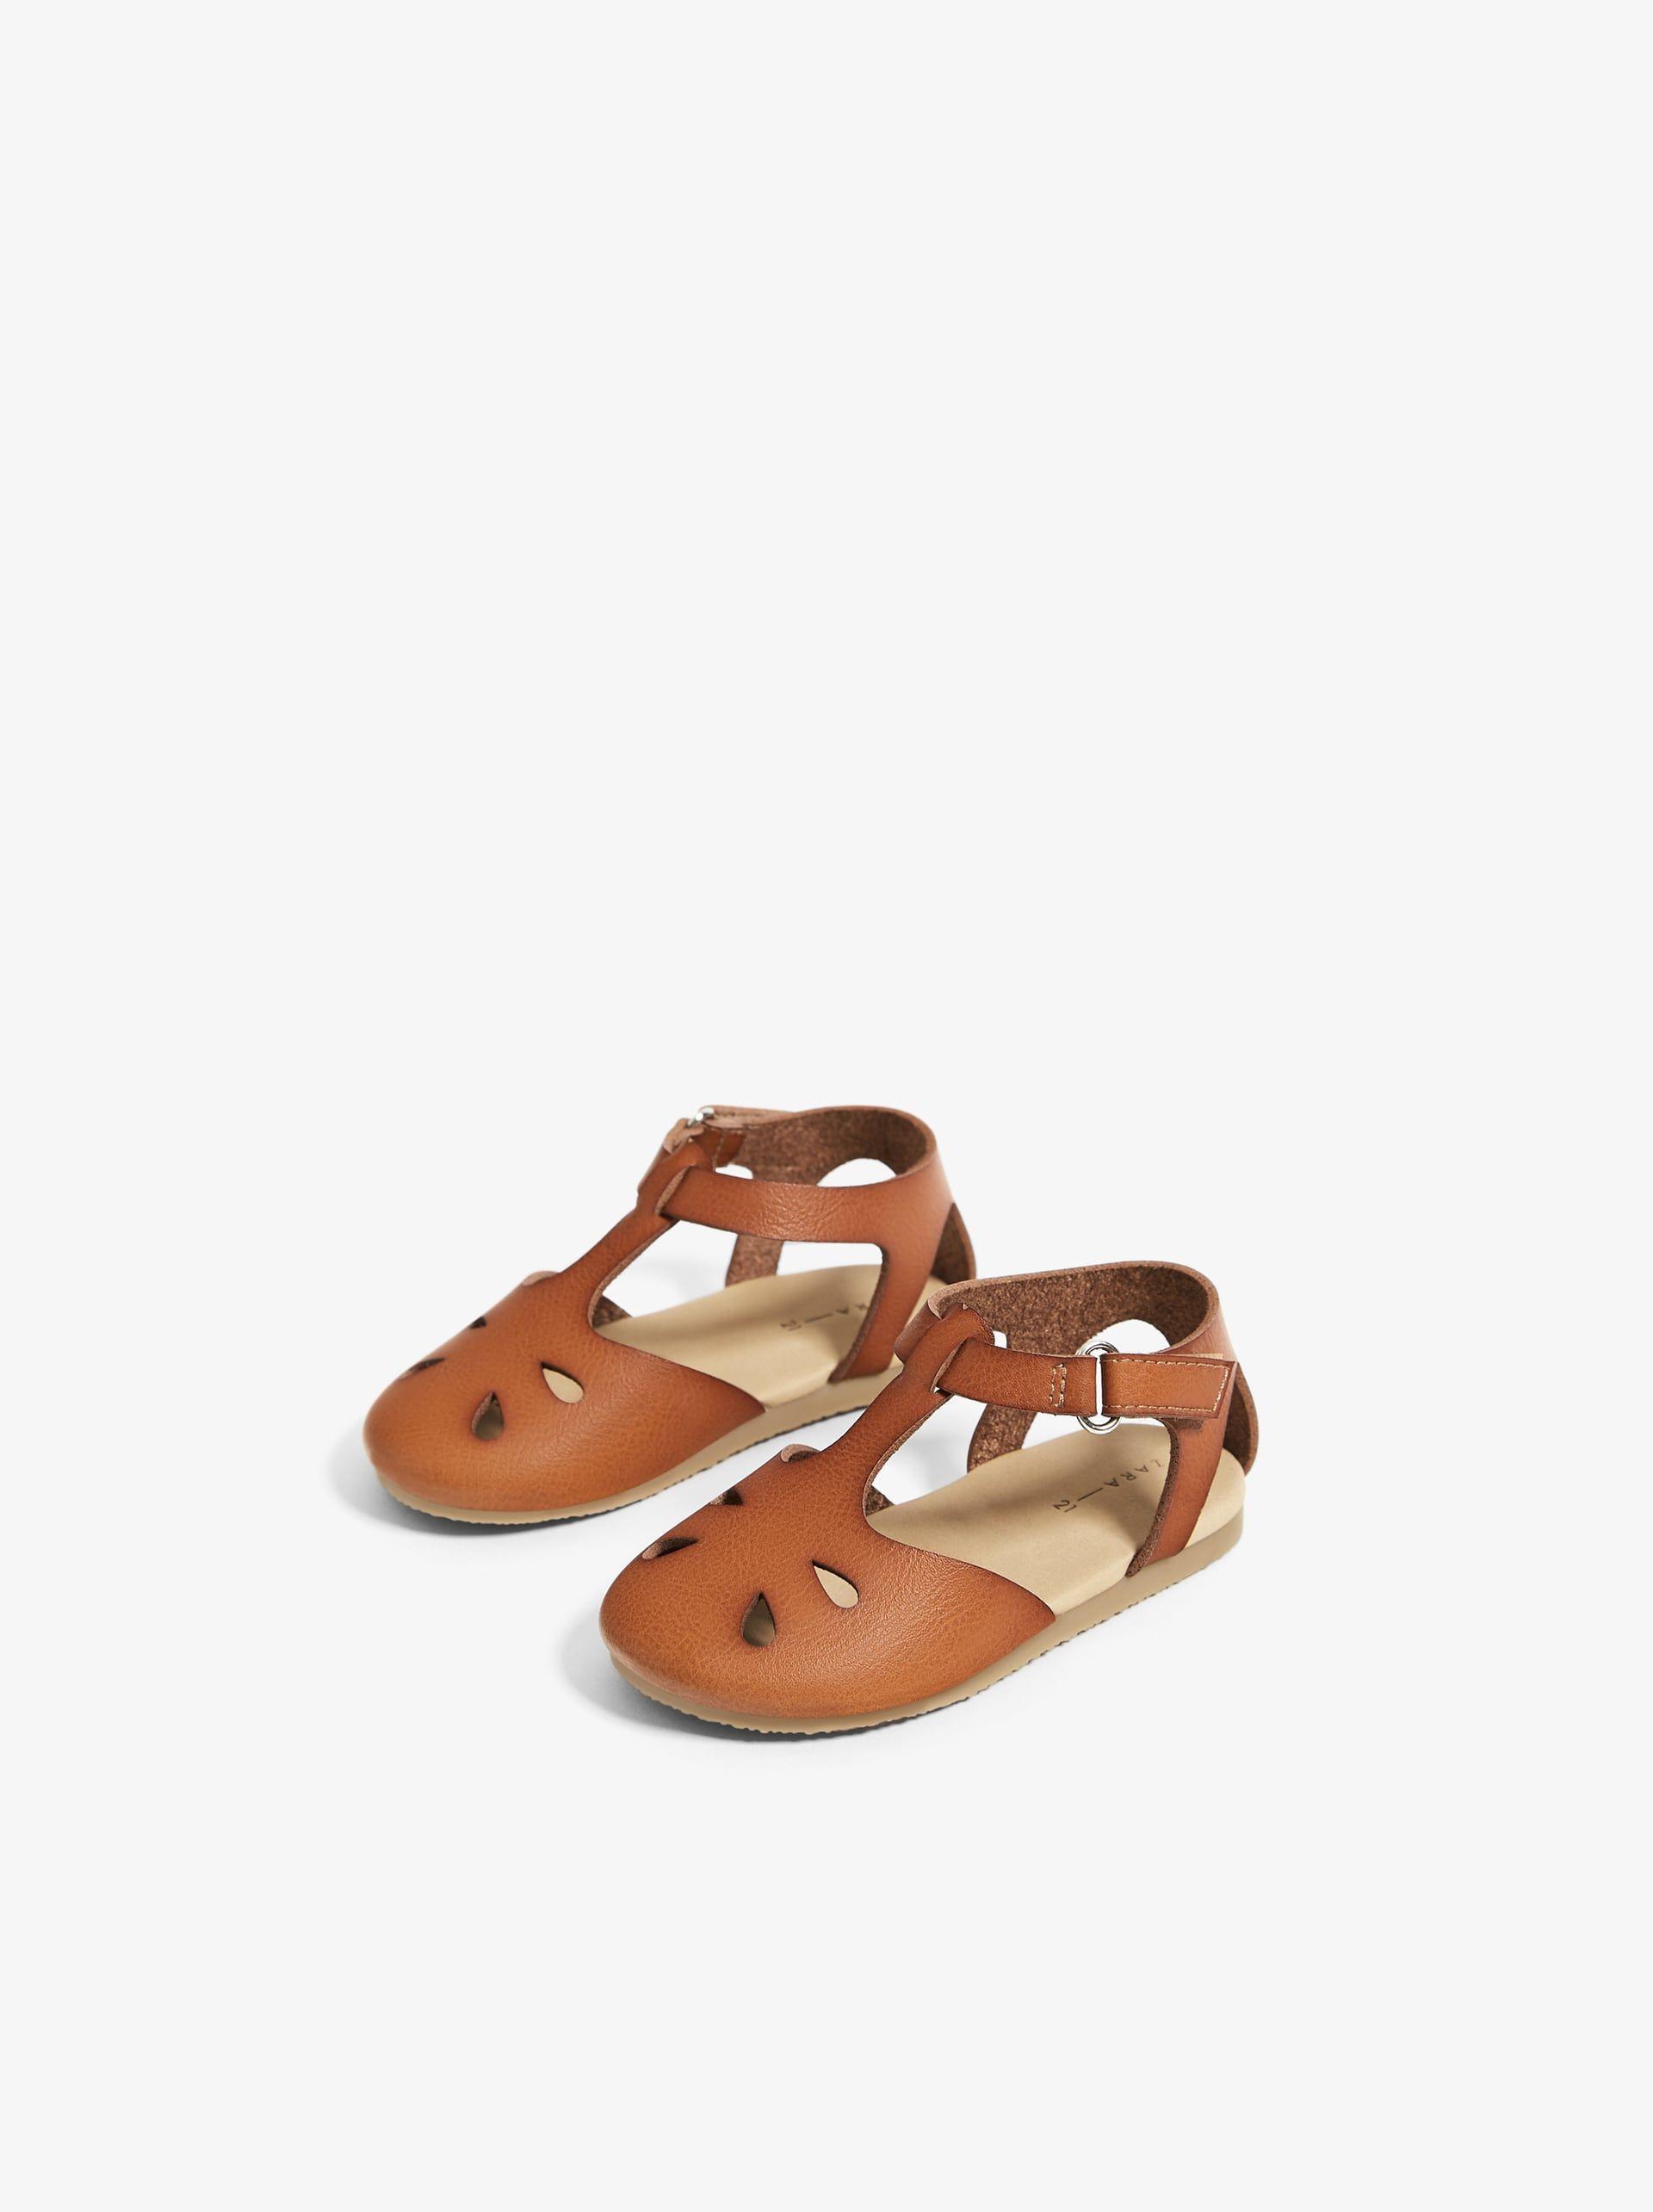 Fisherman sandals   Zara kids shoes